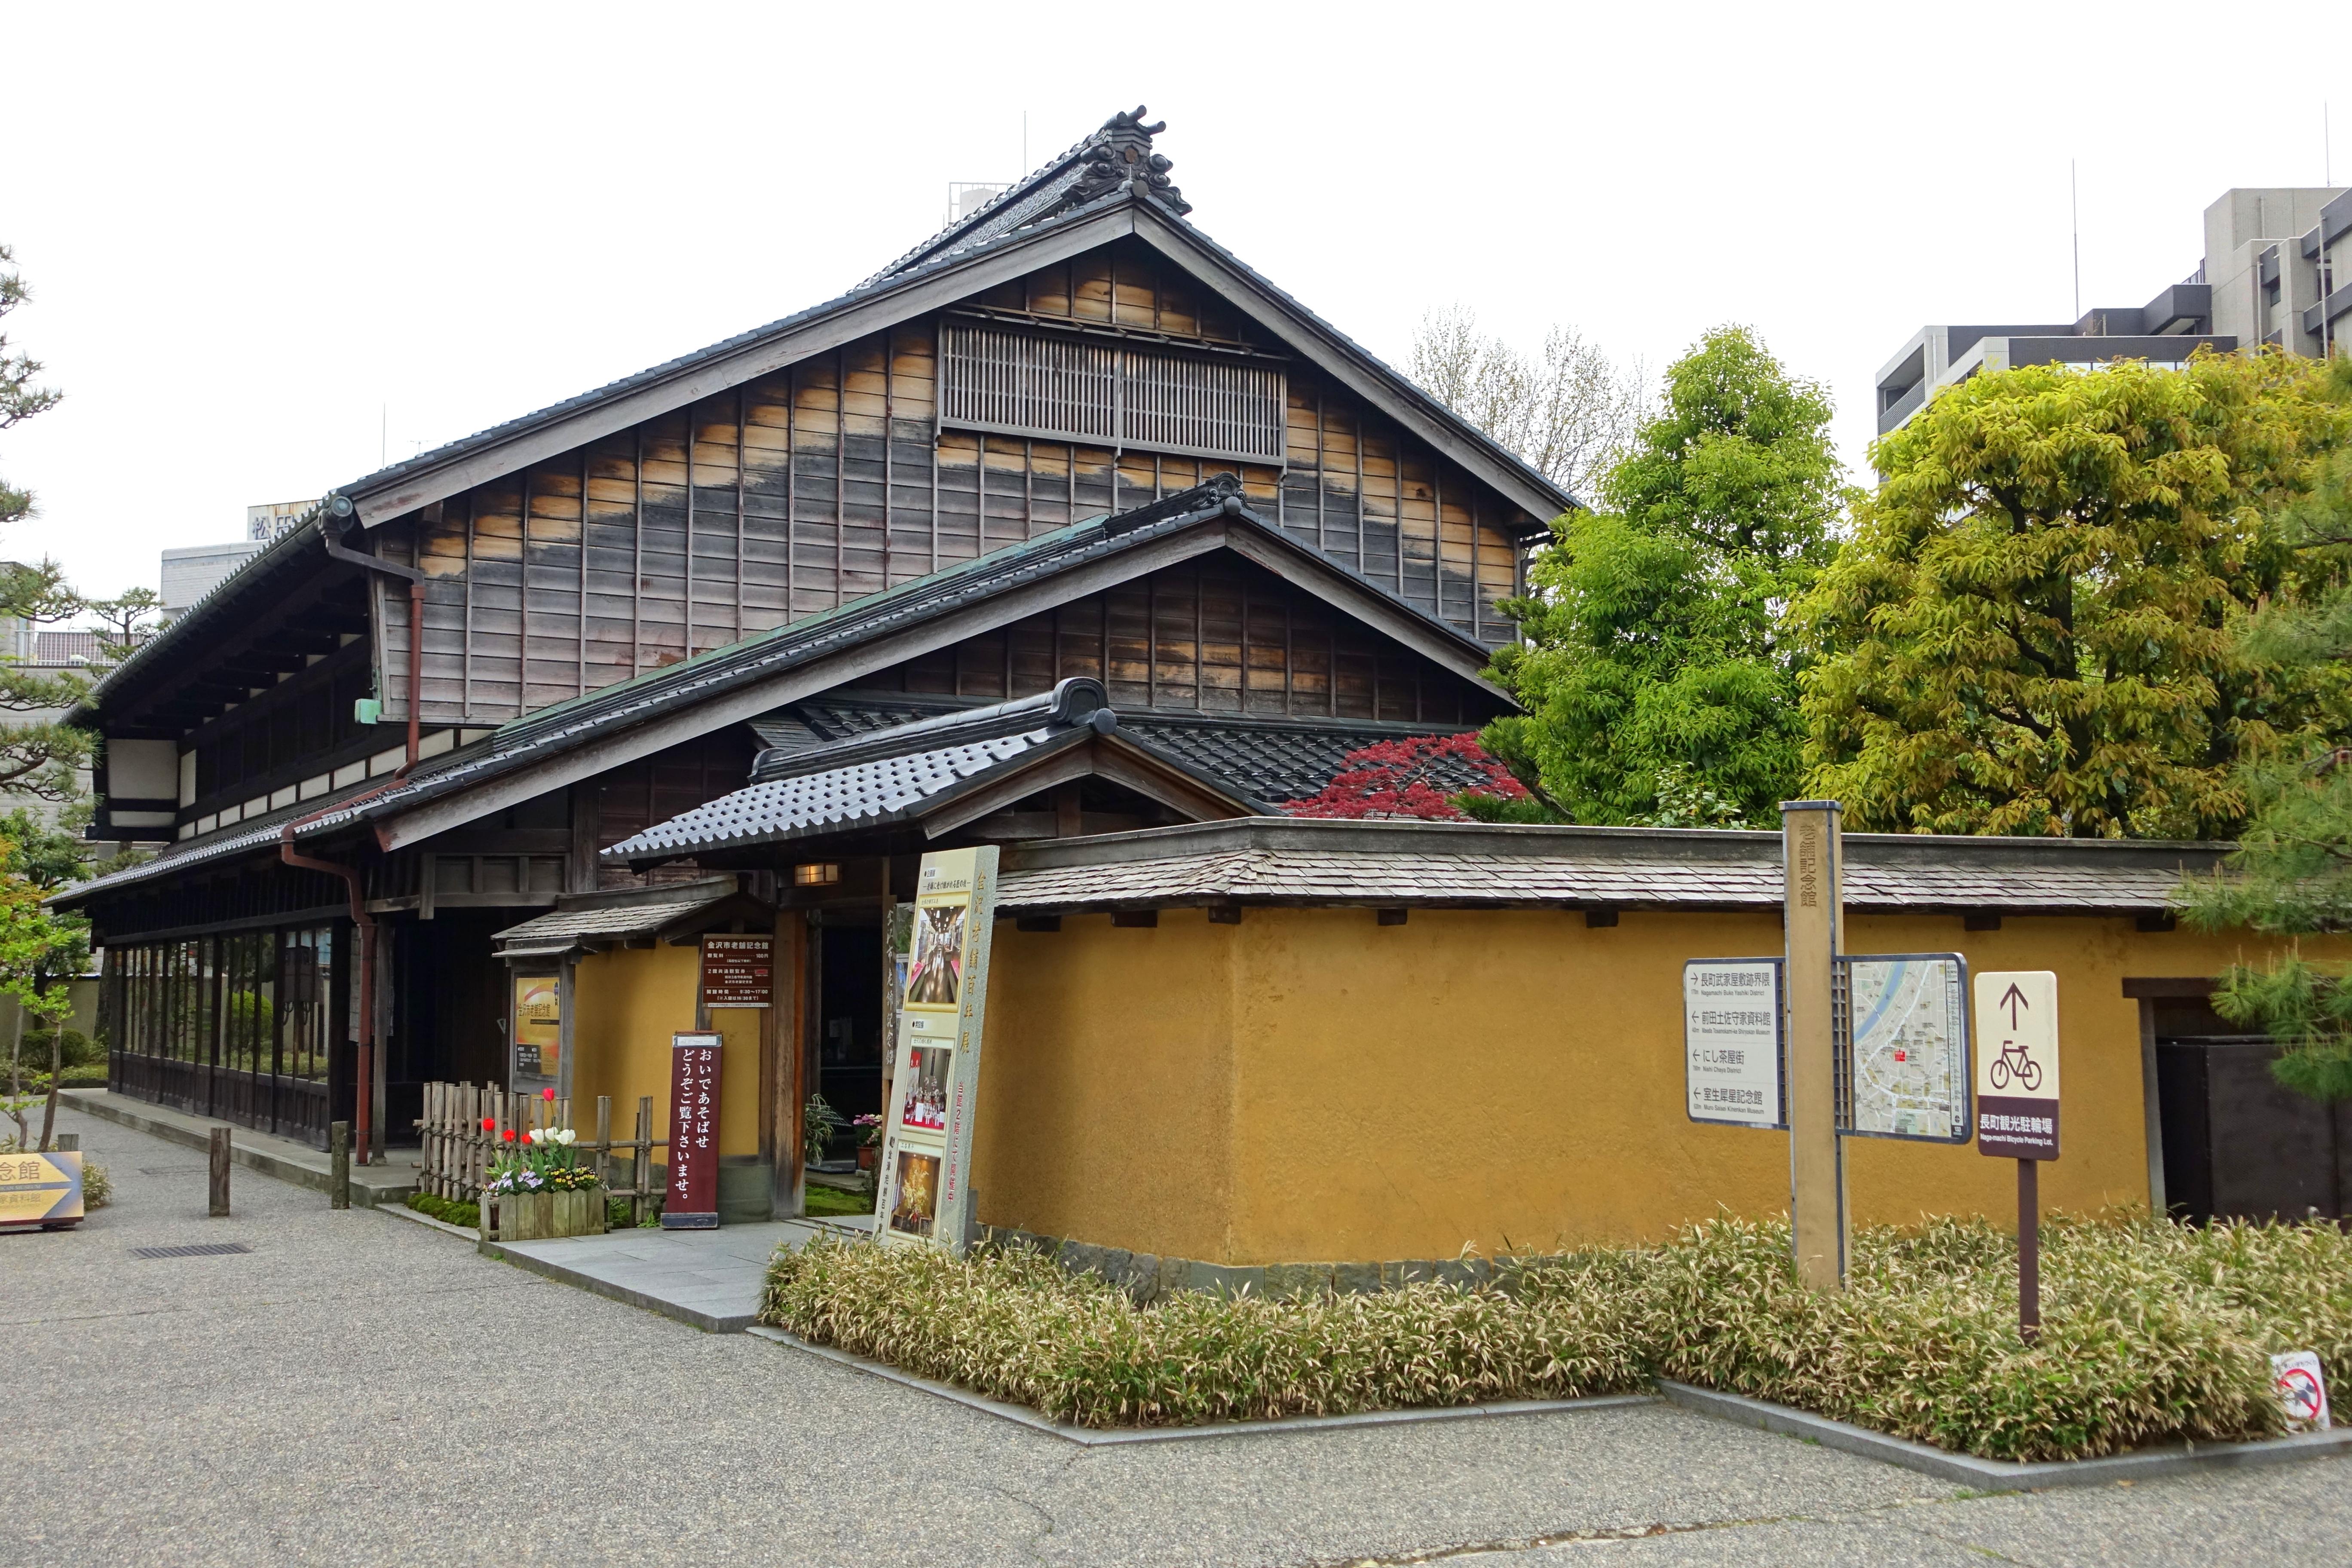 Shinise Kinenkan Museum - Nagamachi - Kanazawa, Japan - DSC00147.jpg